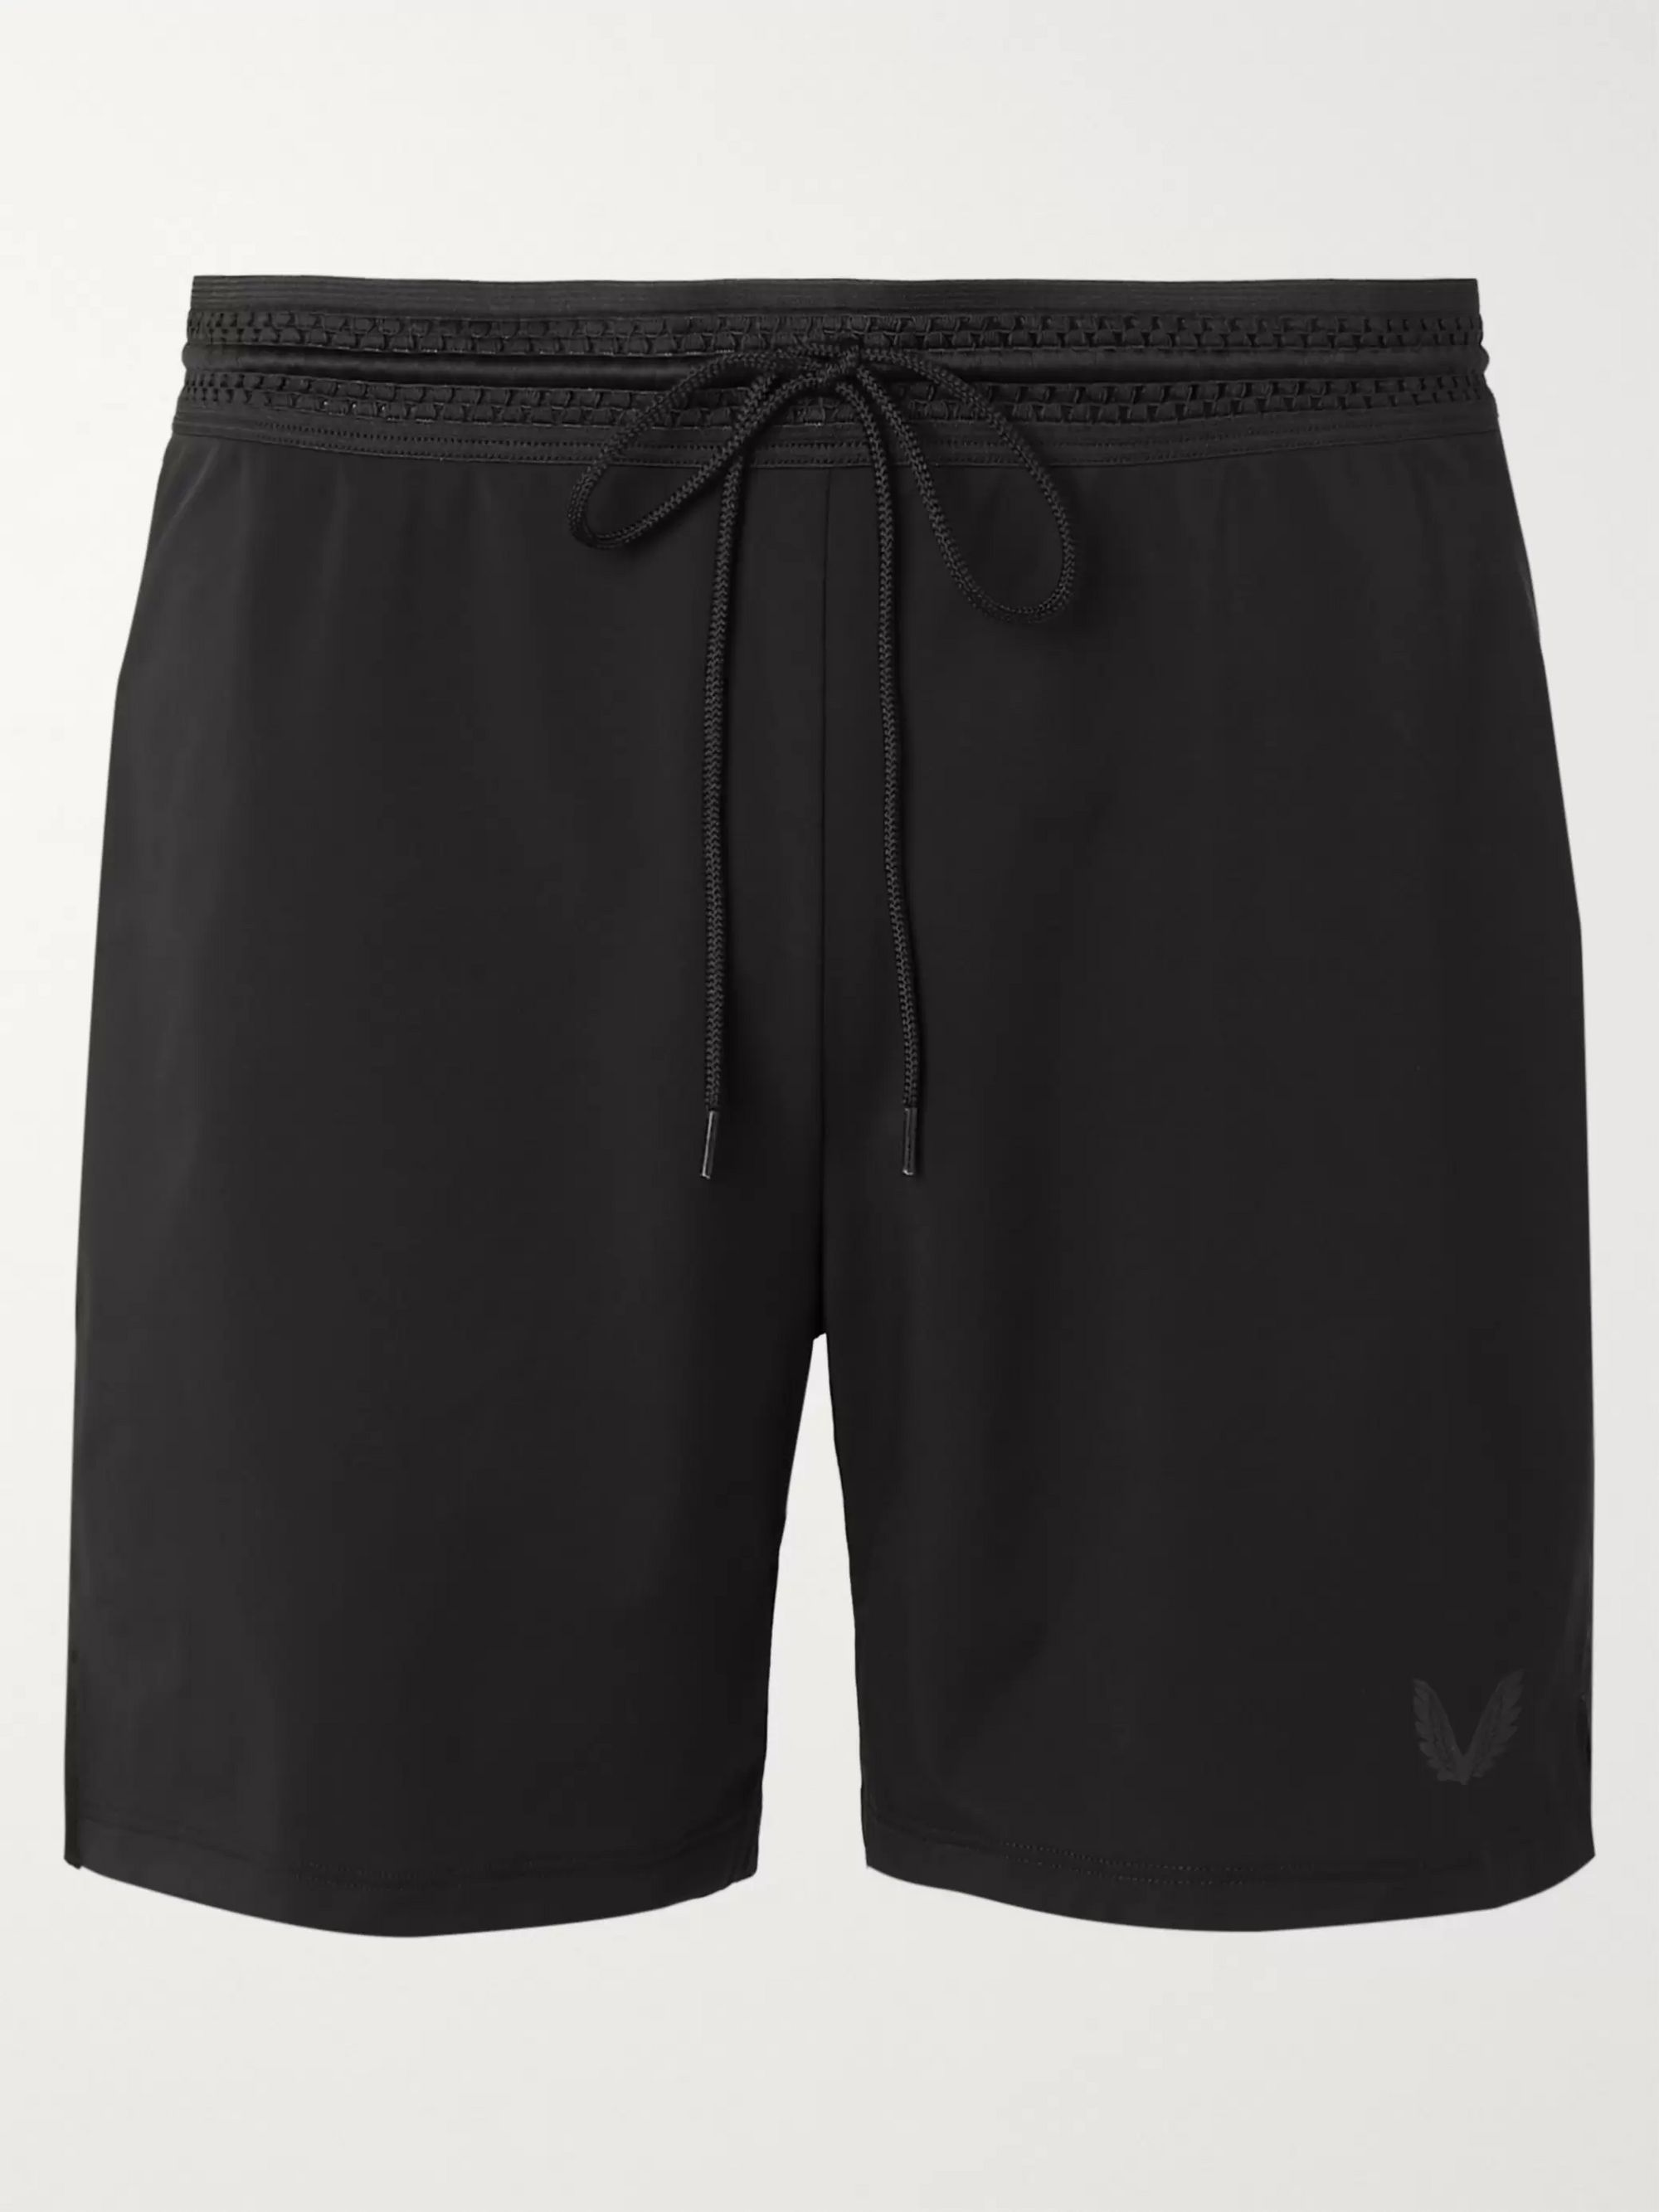 Black Bowden Stretch-Shell Running Shorts | CASTORE | MR PORTER